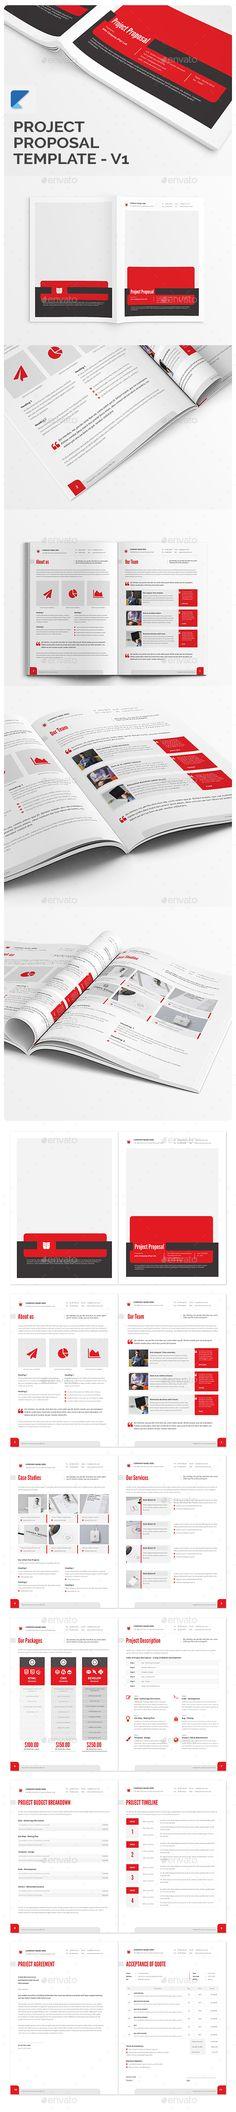 Gstudio Web Proposal Template V2 Proposal templates, Proposals - product sales proposal template